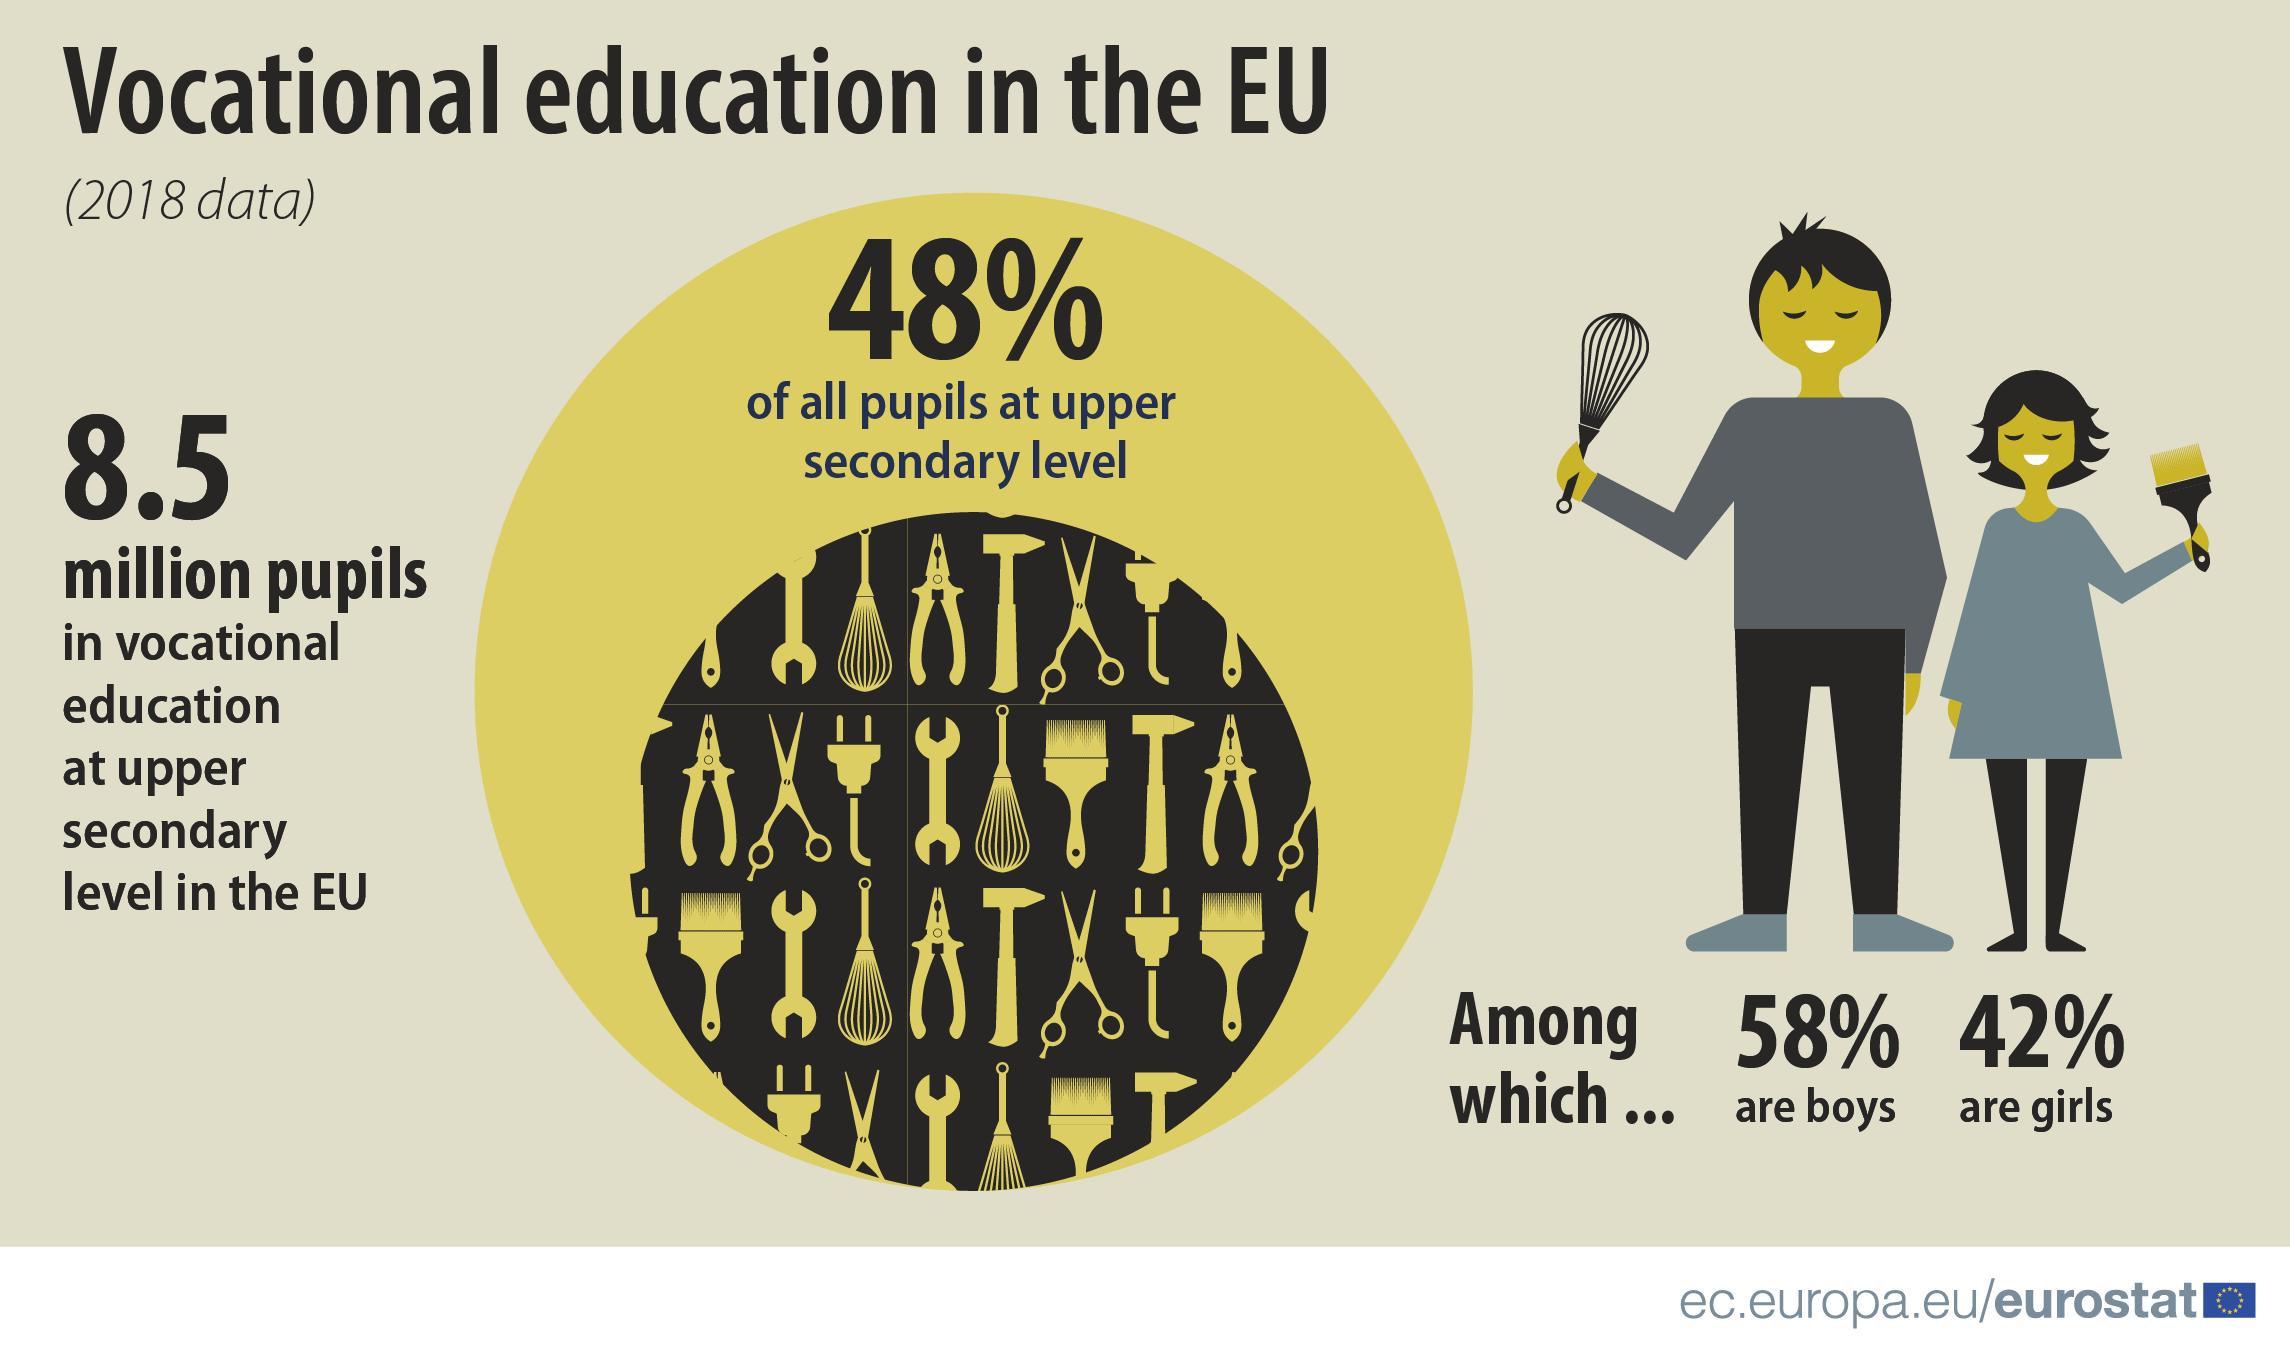 Almost half of EU pupils study vocational programmes - Product - Eurostat